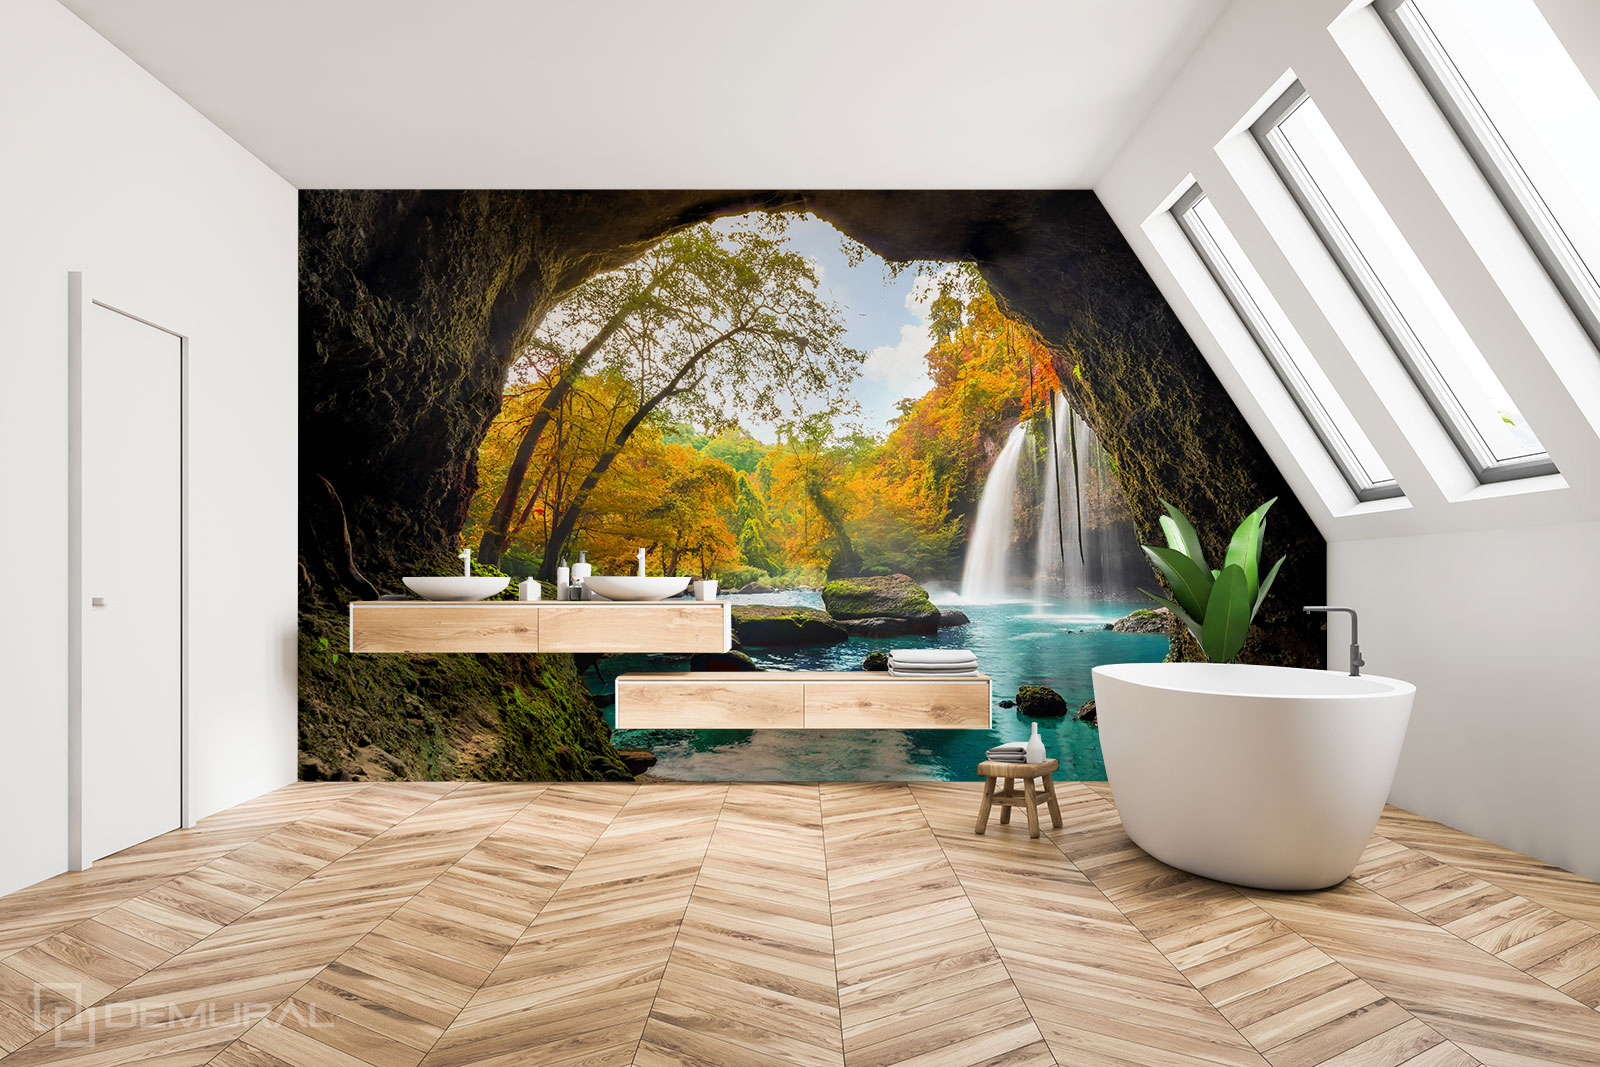 Fototapete Eine private Oase - Fototapete im Badezimmer - Demural